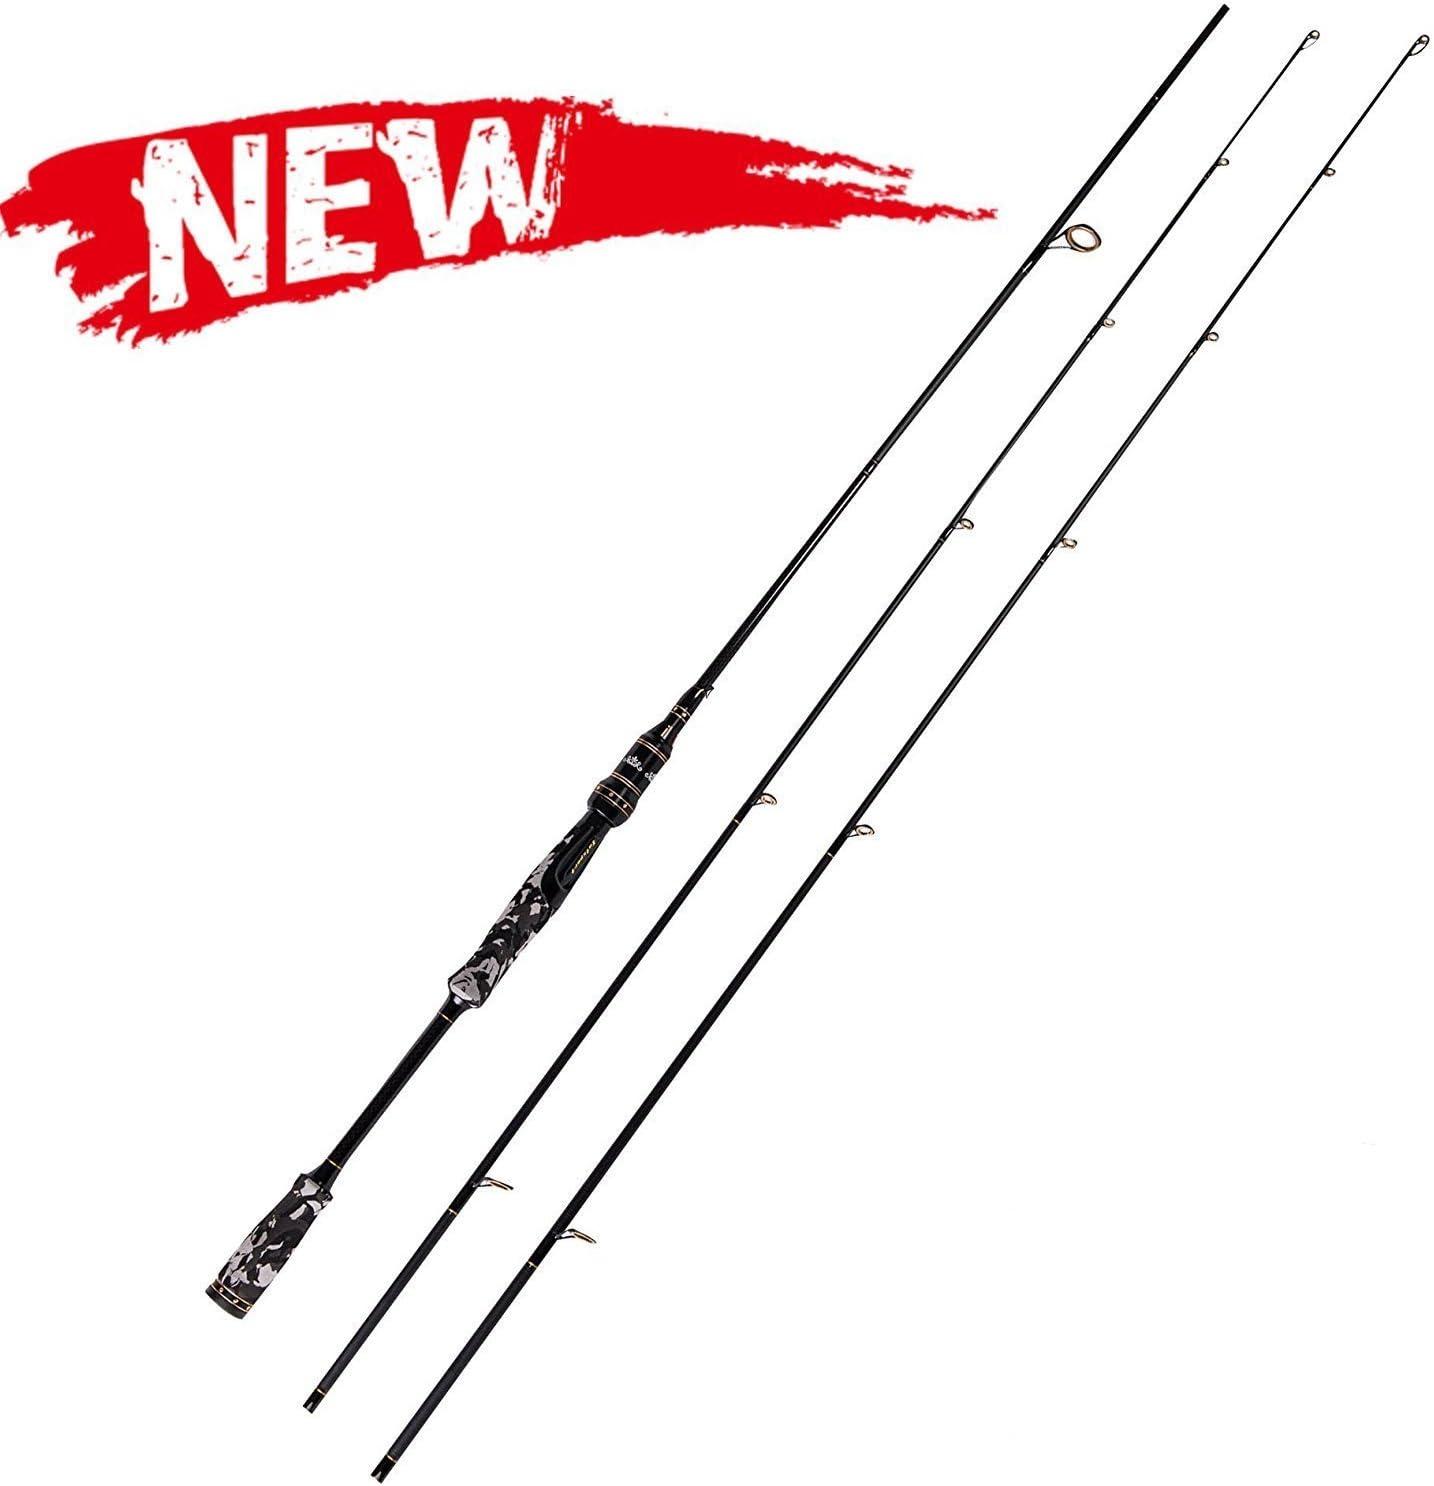 Entsport Camo Legend 2-Piece Spinning Rod